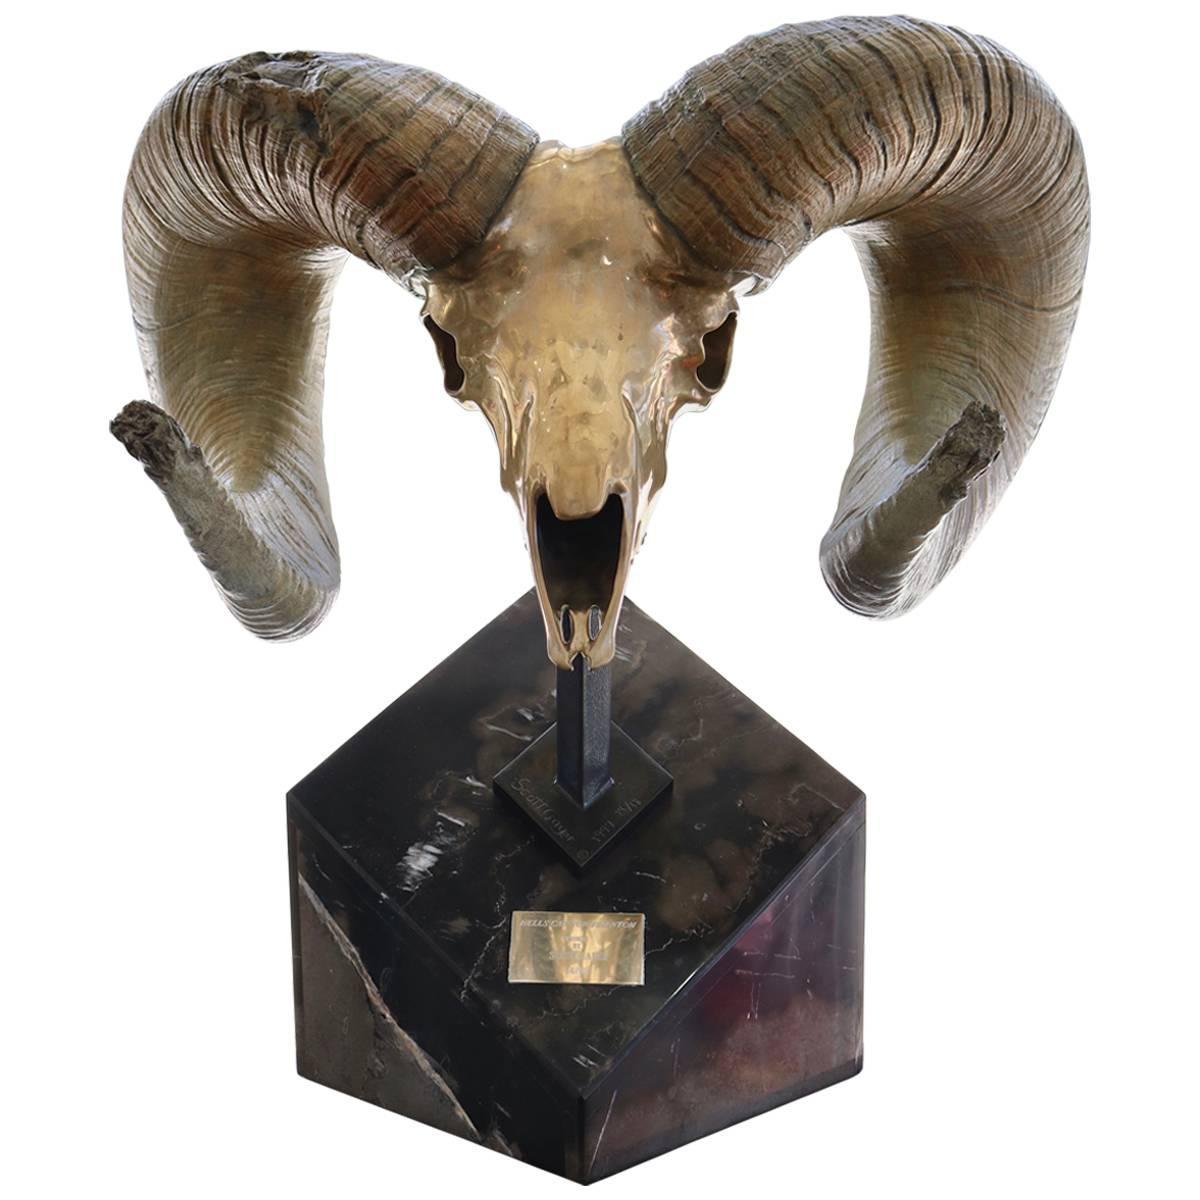 Bronze Sculpture of a Rams Head Skull